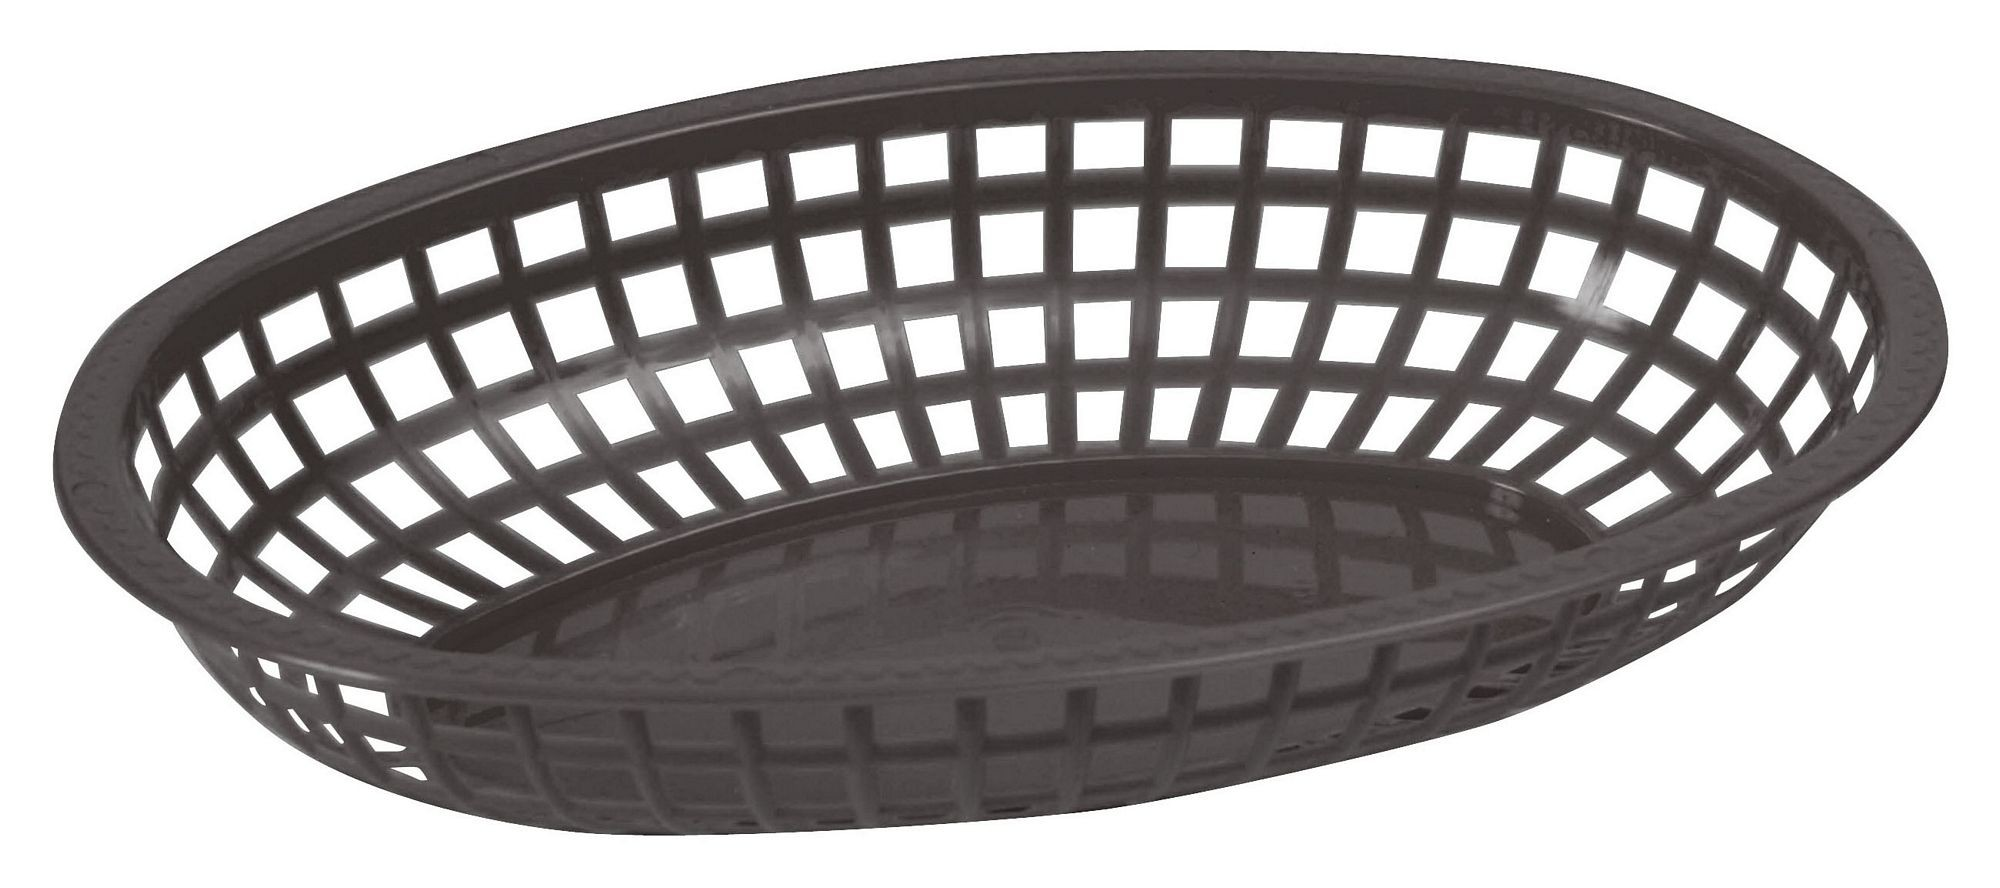 Premium Oval Basket - Tuxedo Black